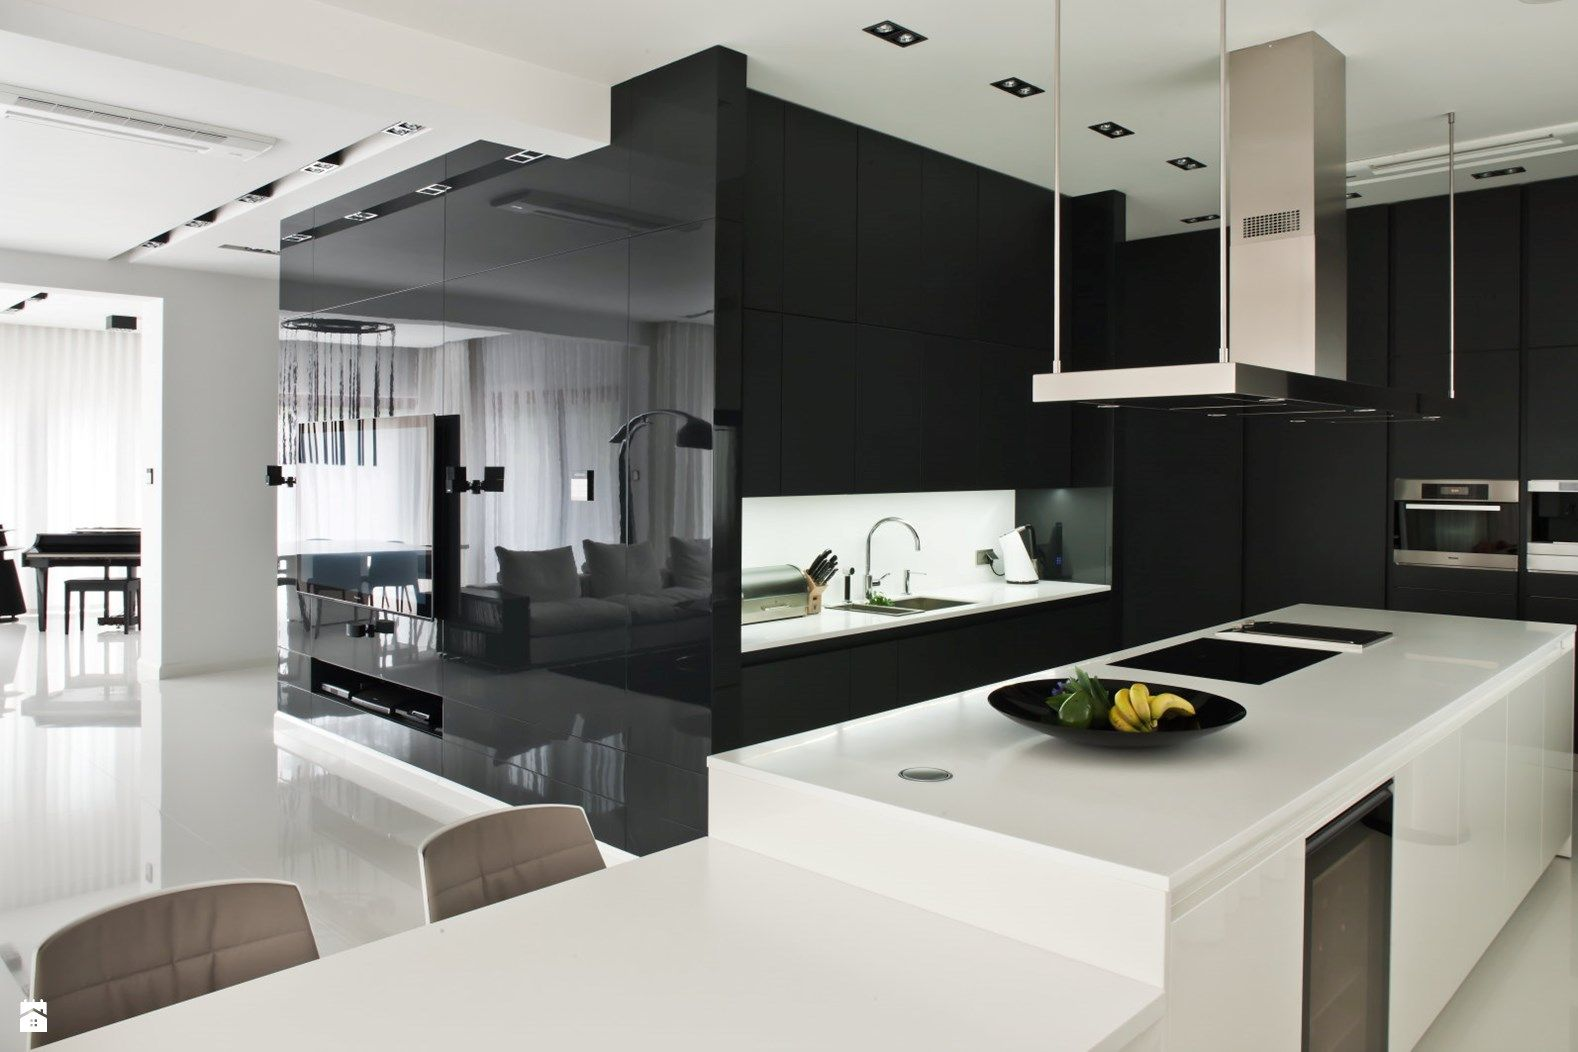 Zdjecie Kuchnia Styl Minimalistyczny Home Decor White Interior Black And White Interior